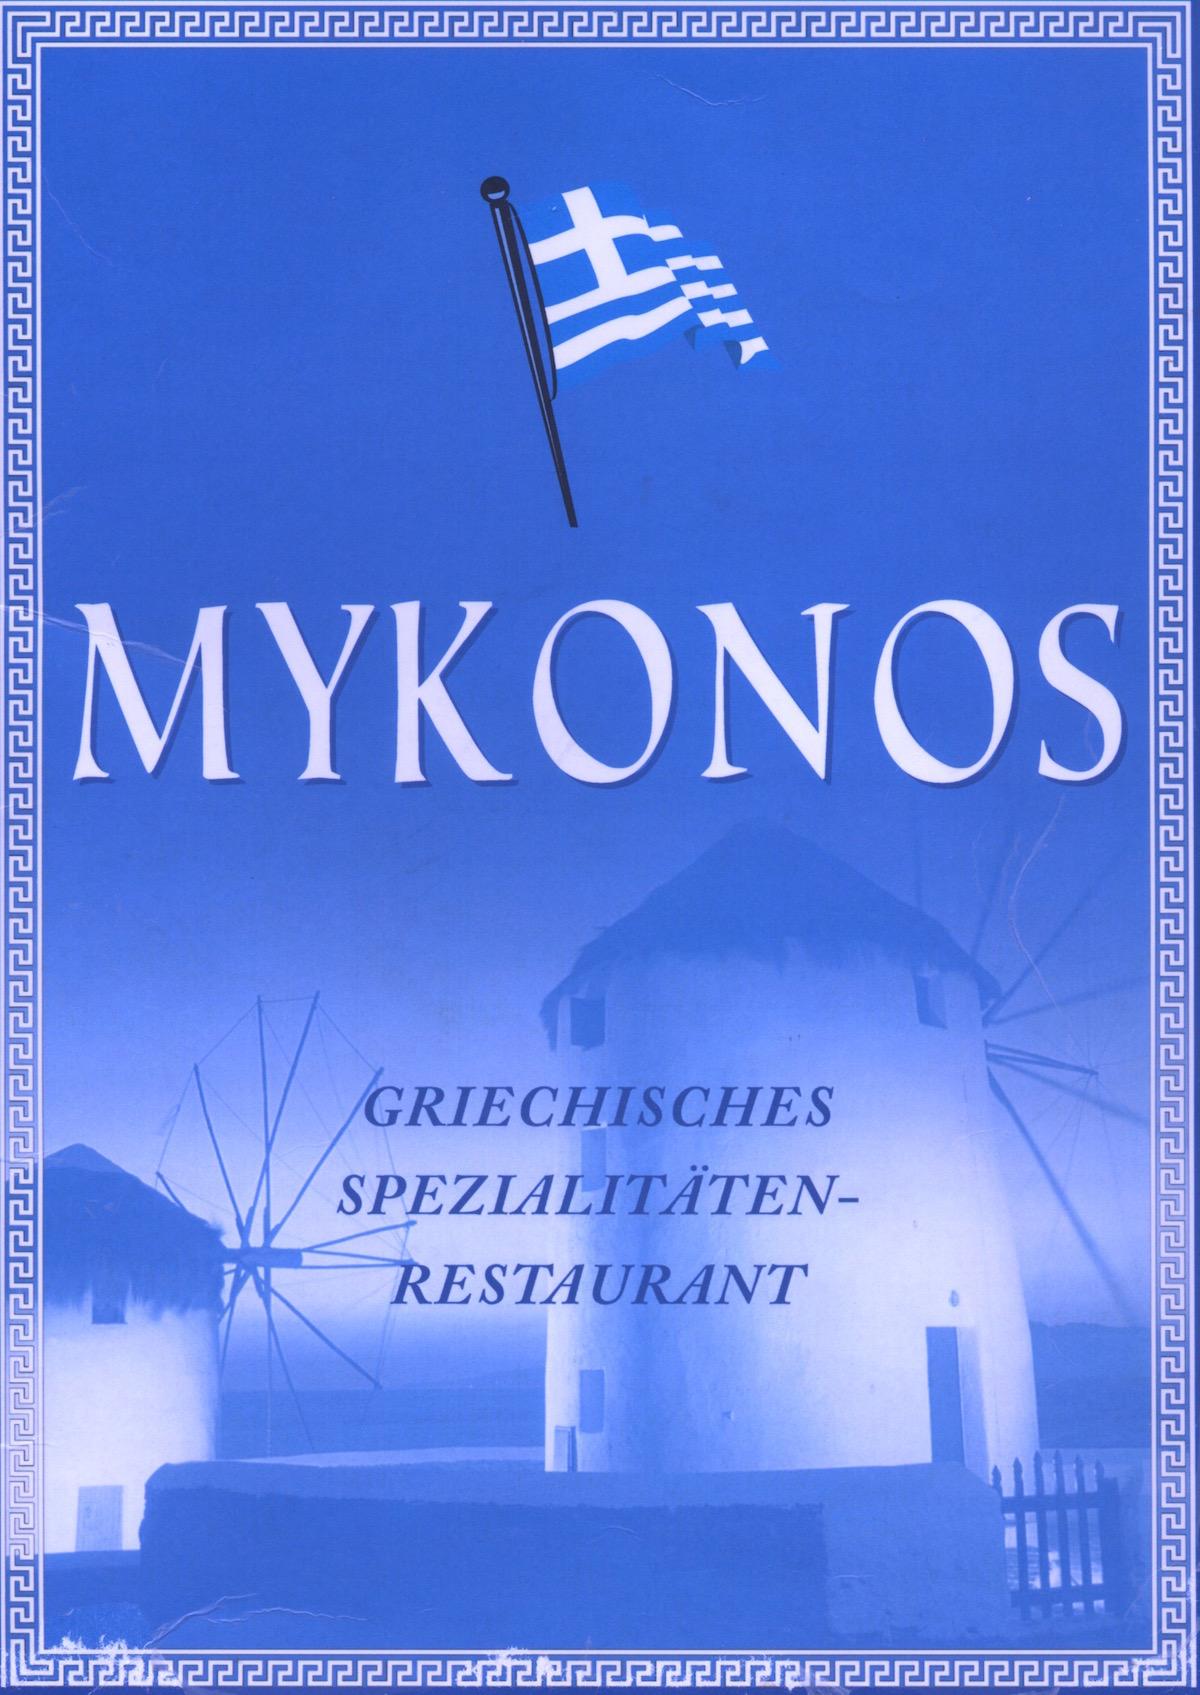 mykonos-1